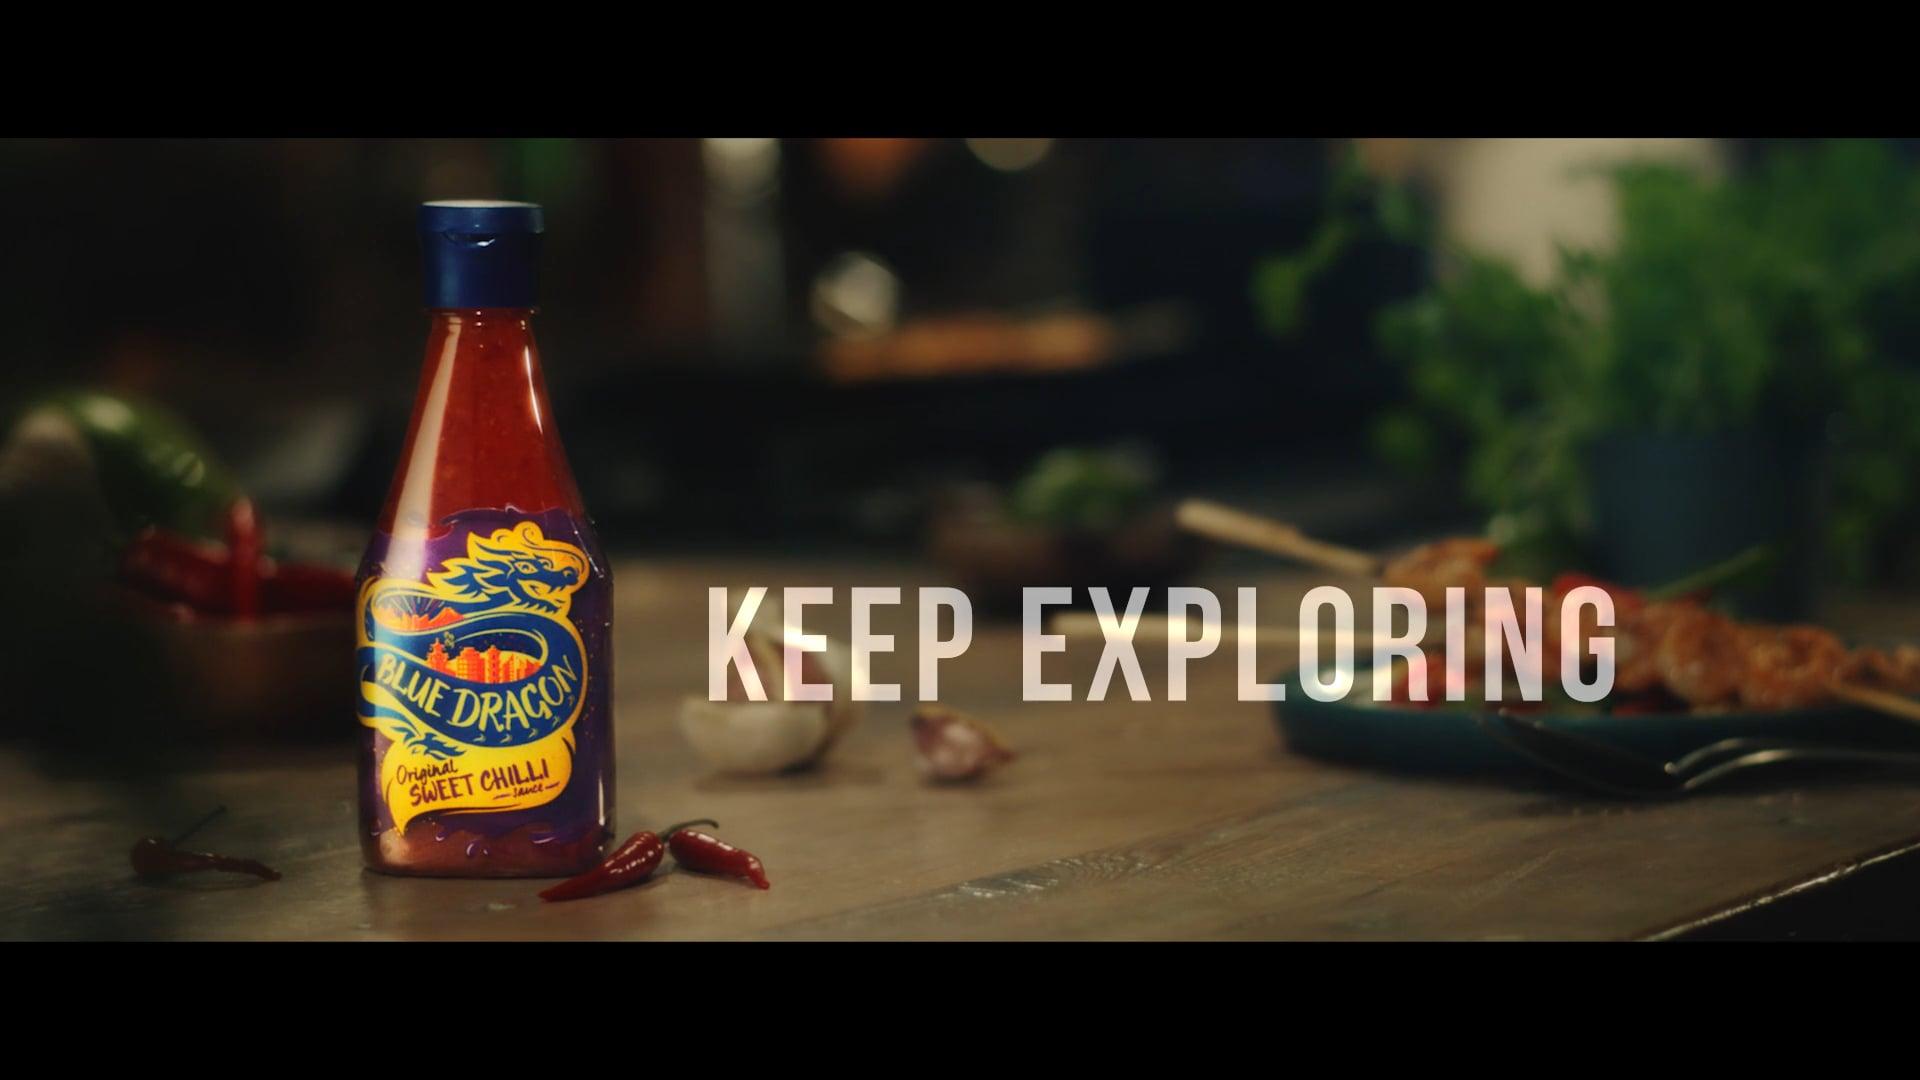 Blue Dragon - Sweet Chilli Sauce